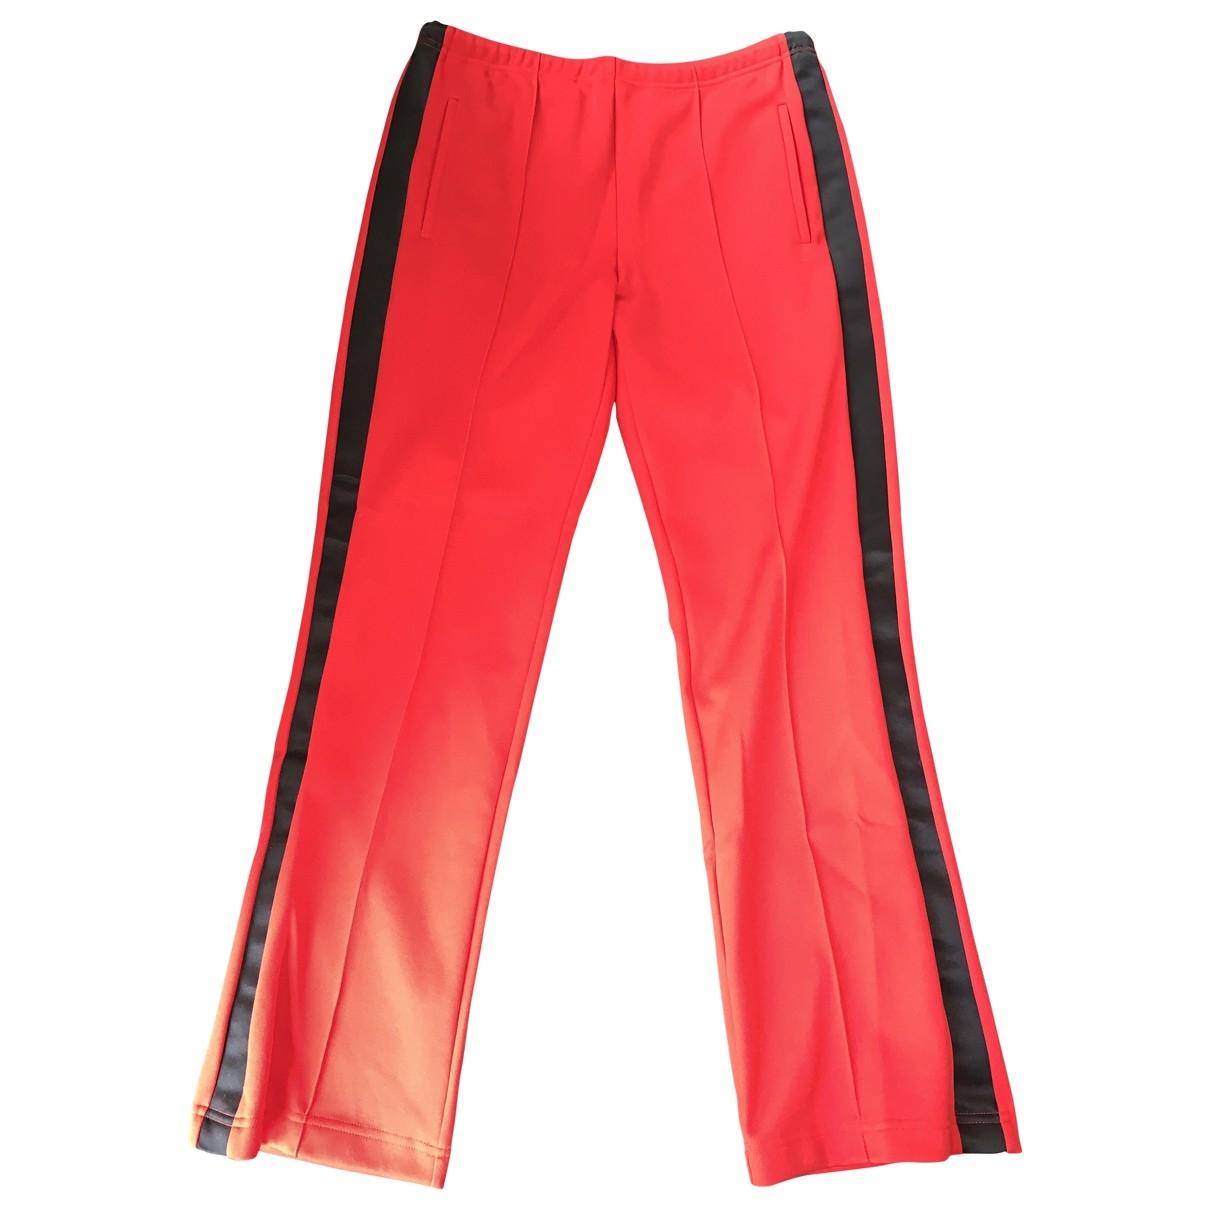 Maison Martin Margiela \N Red Cotton Trousers for Men 48 IT